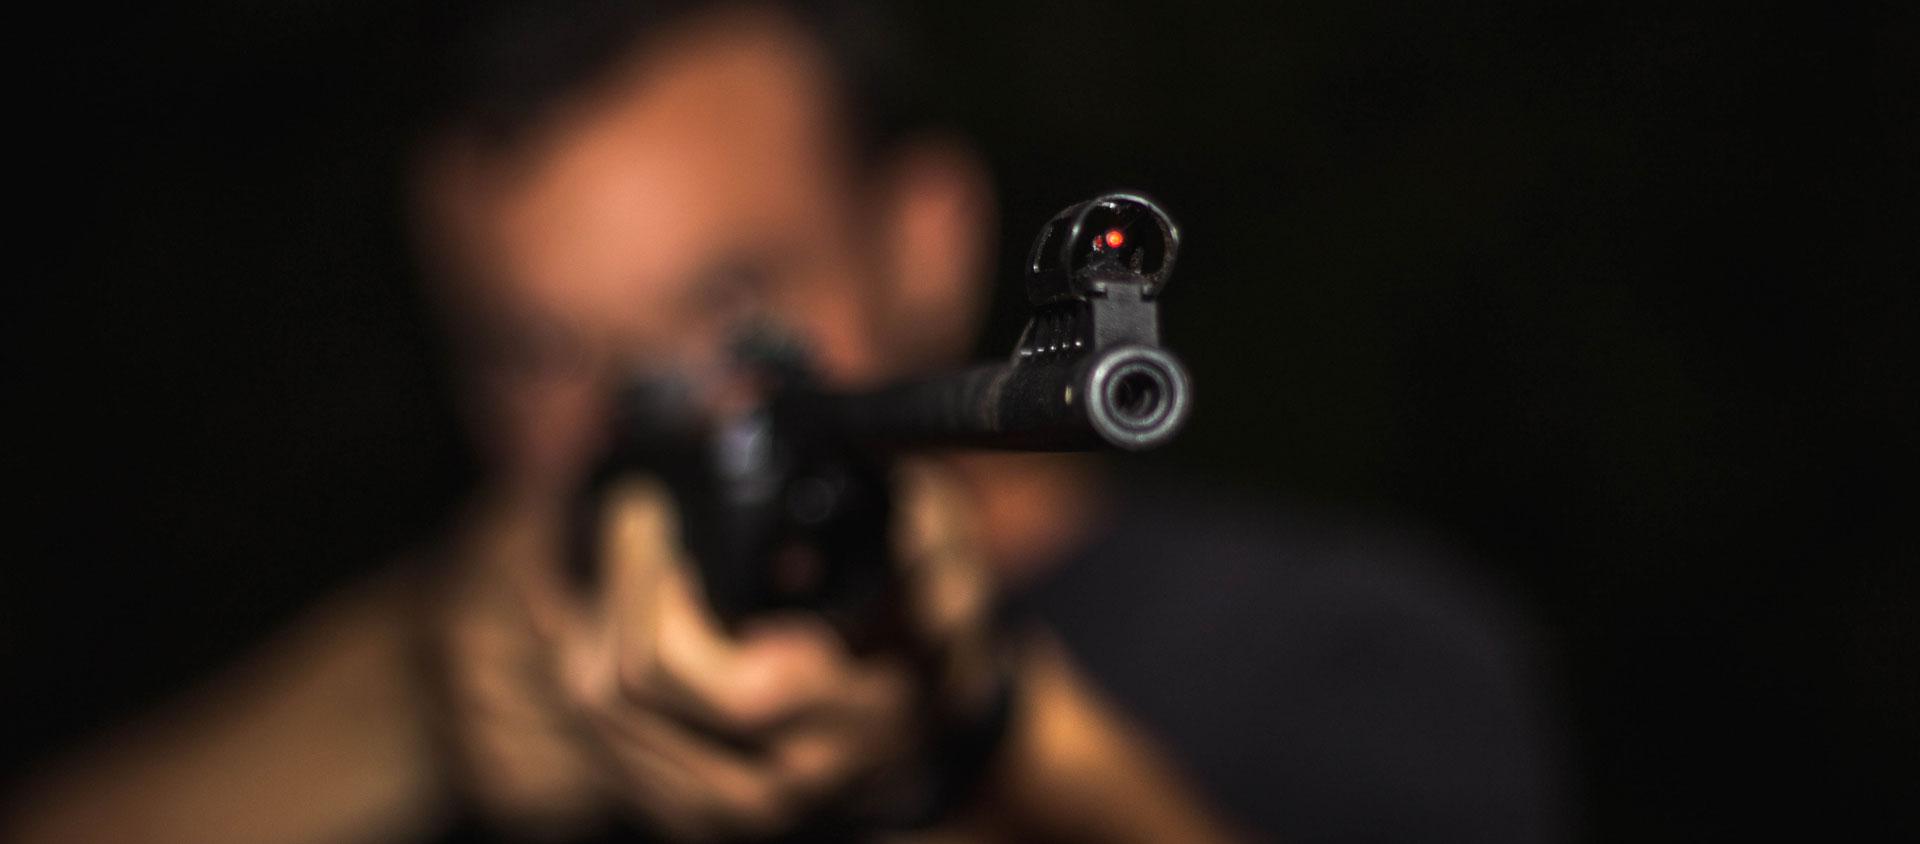 assault-rifle-blur-close-up-1592109-Large-b